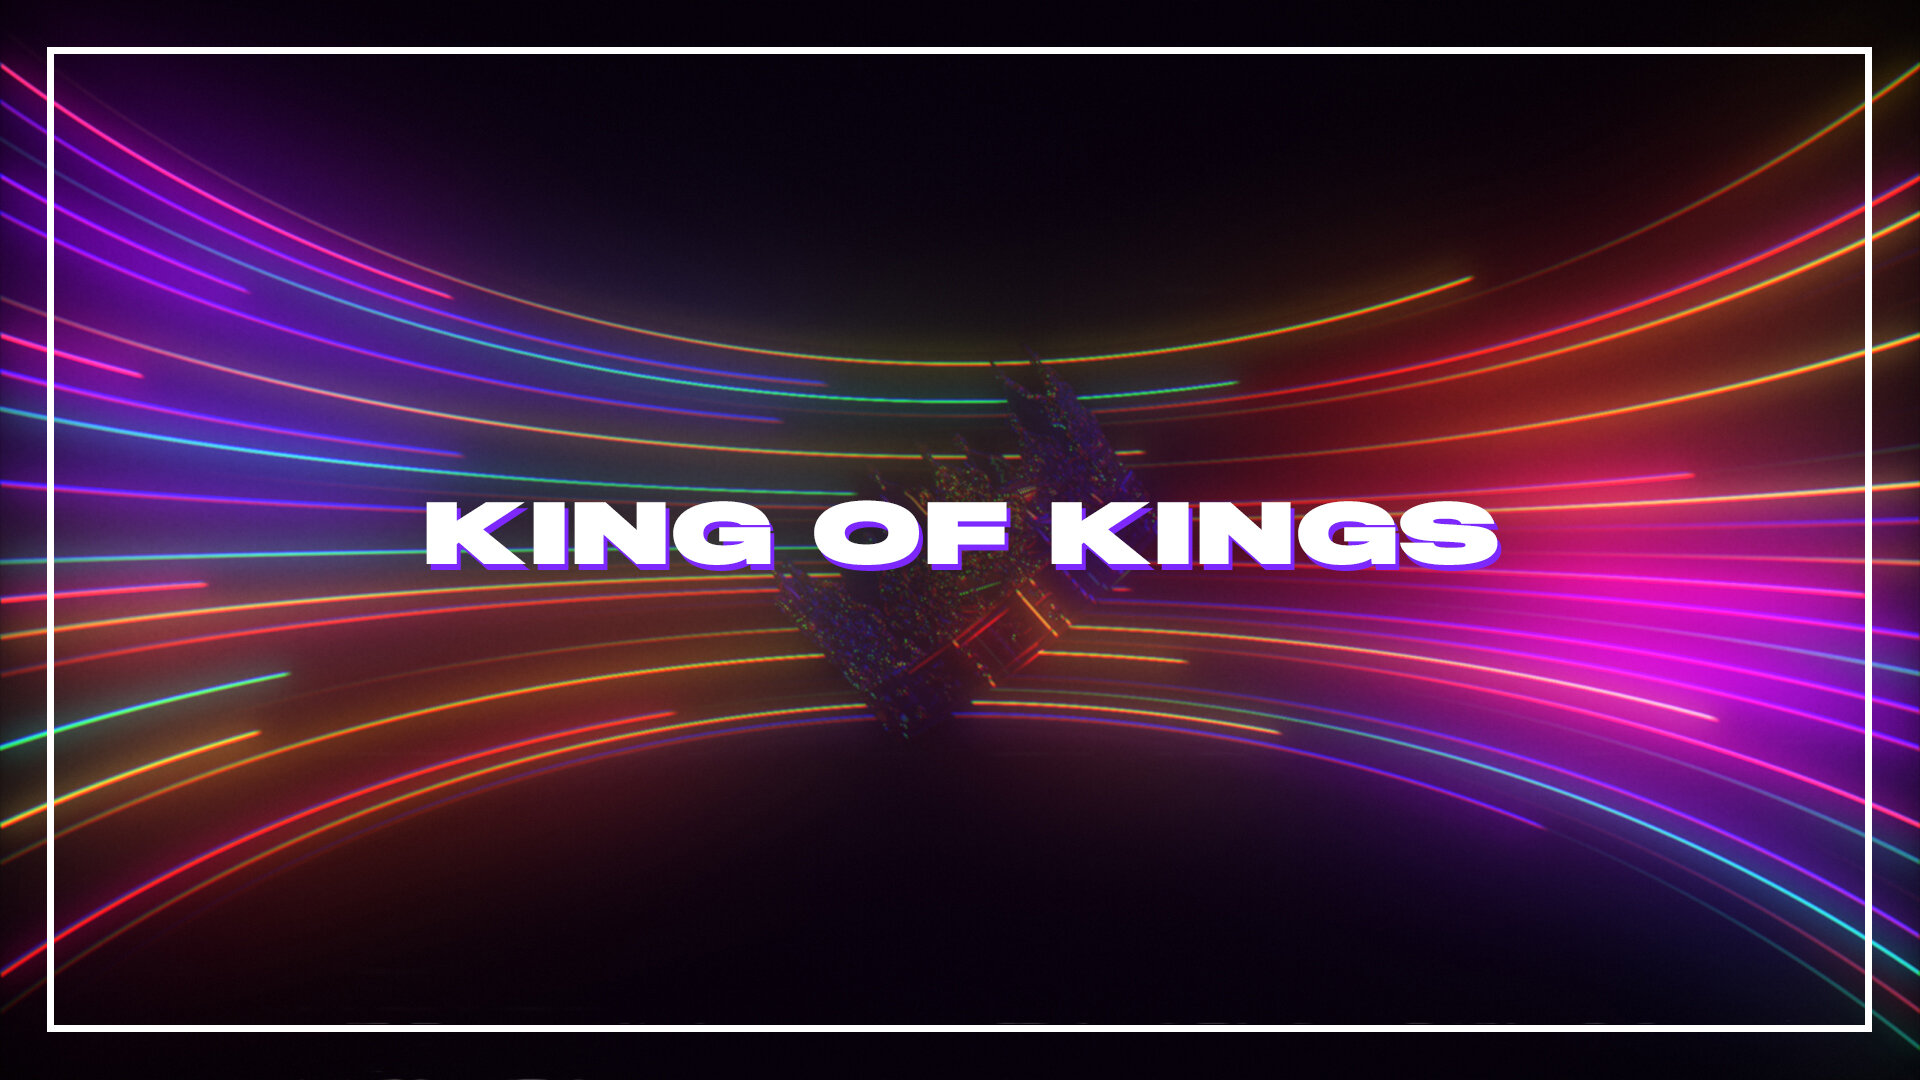 SeeingSounds_KingOfKings_CollectionThumbnail.jpg